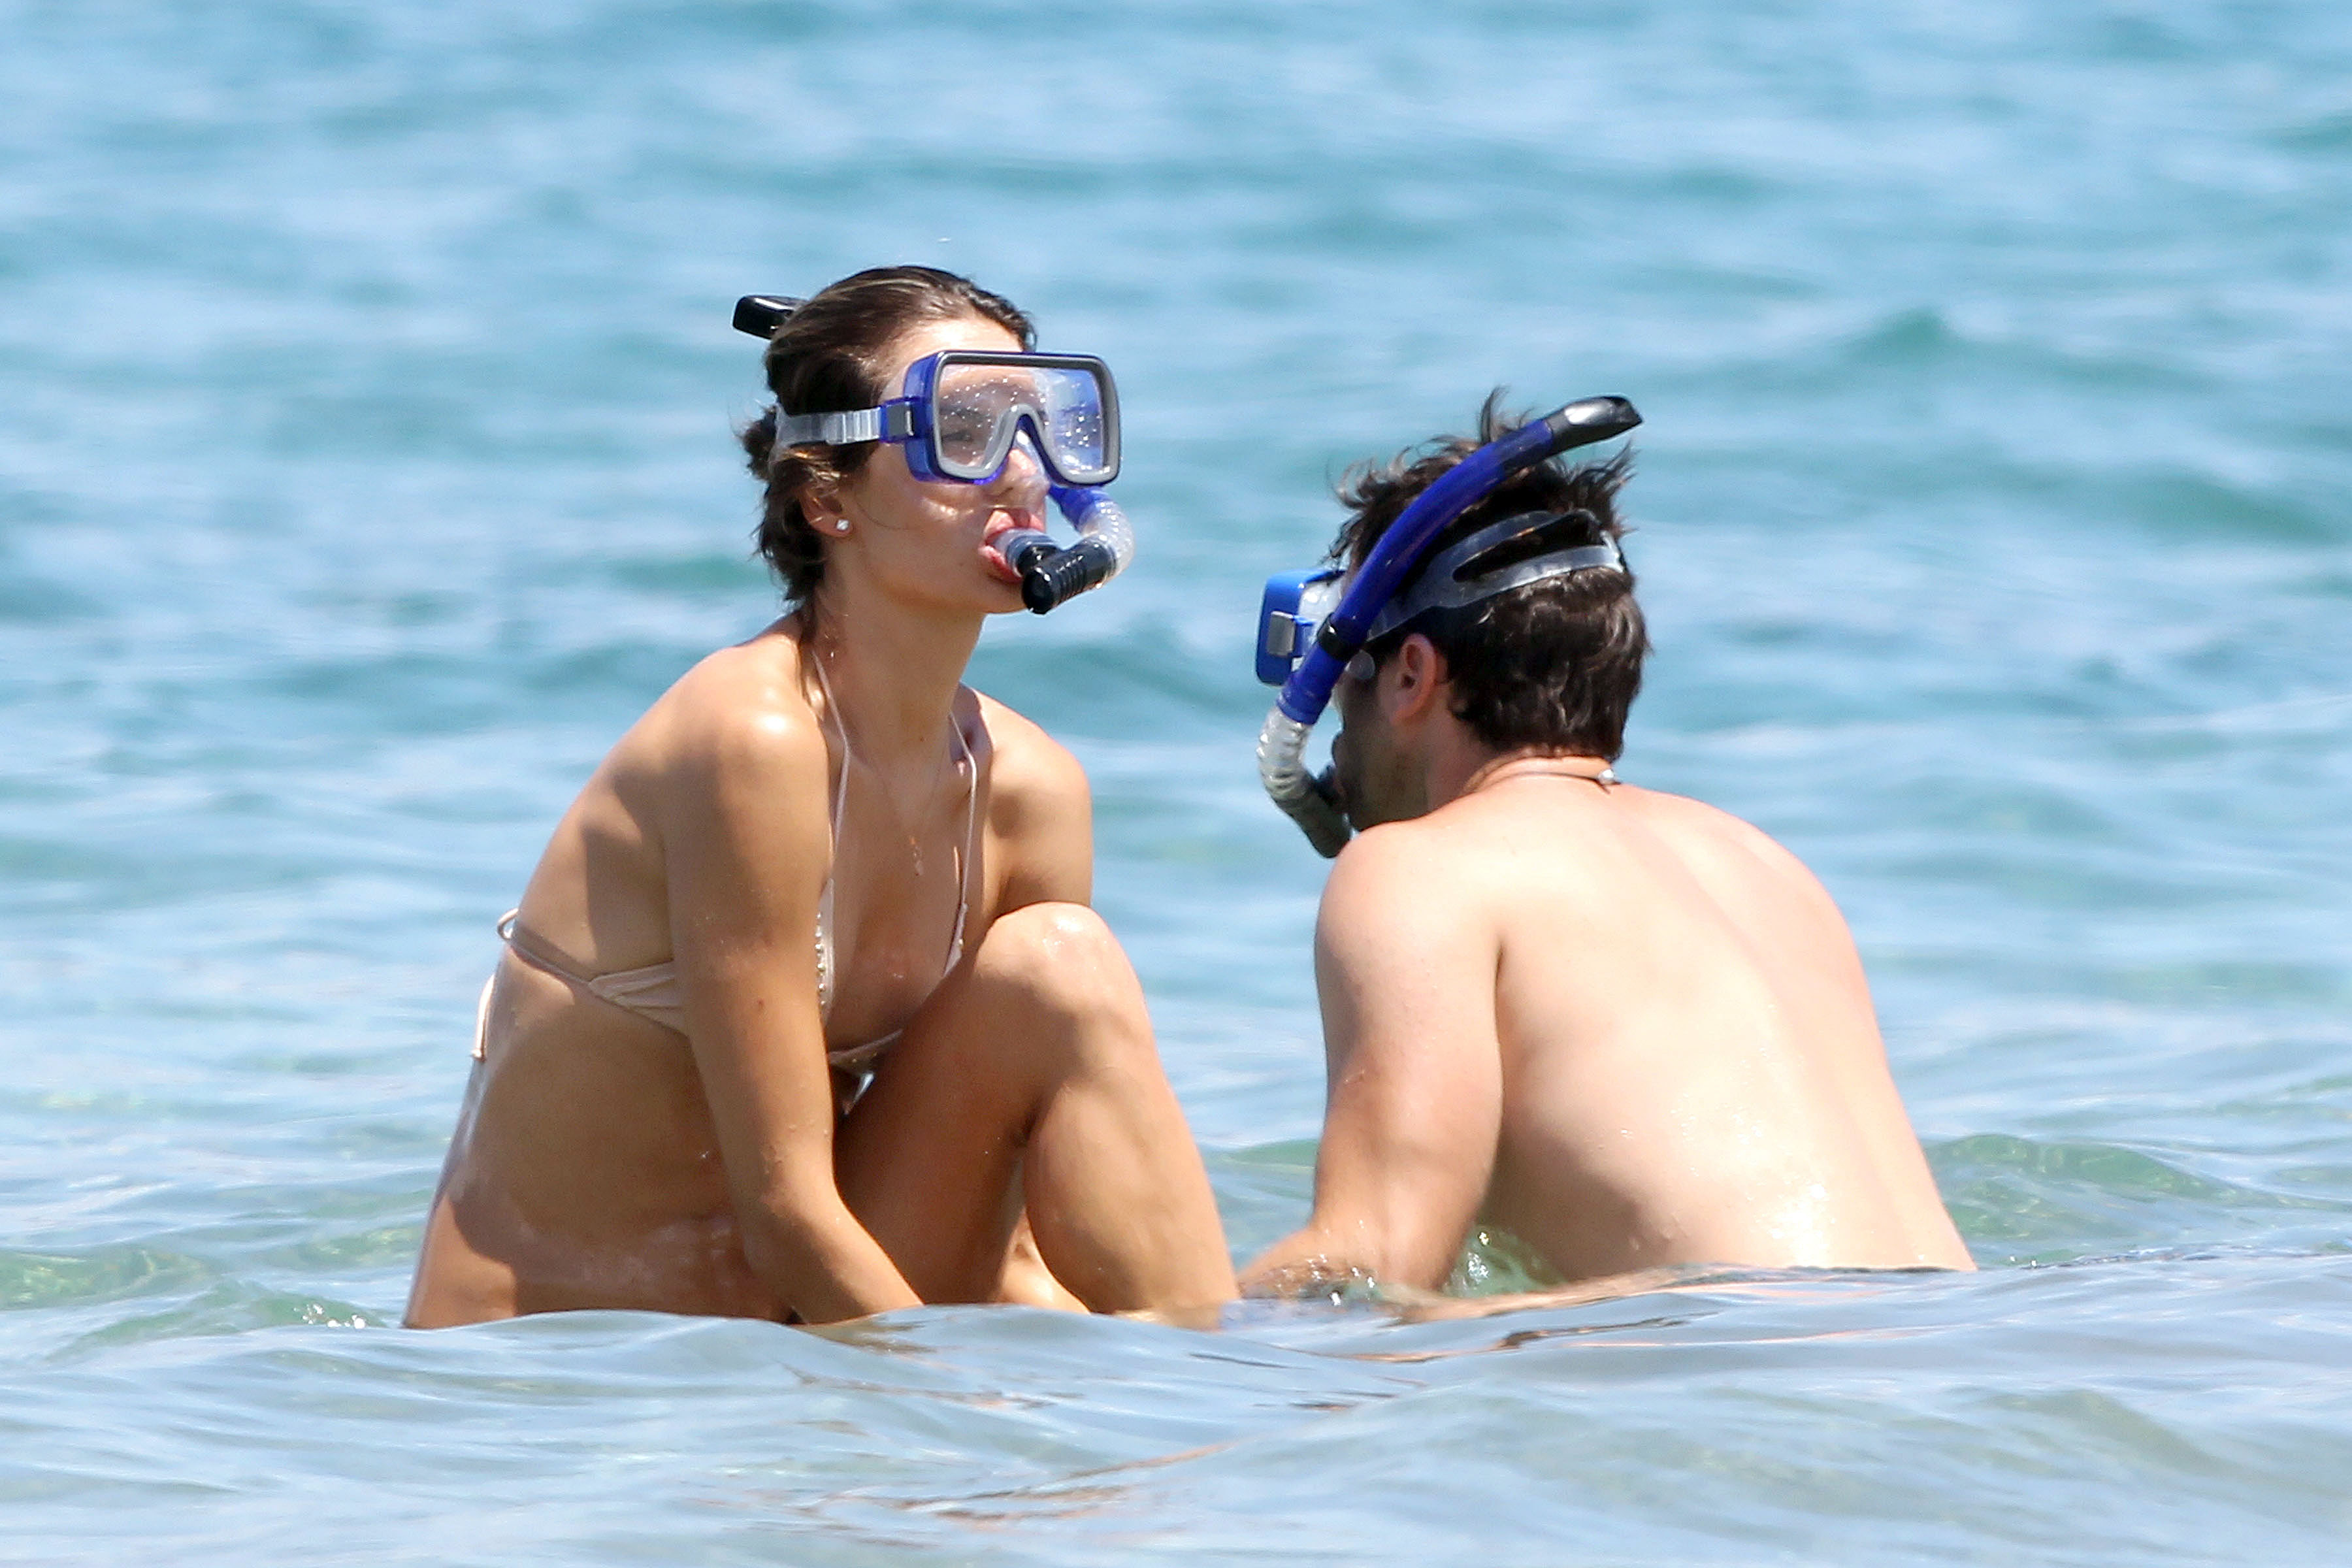 79647_Alessandra_Ambrosio_on_the_beach_in_Hawaii_2_122_18lo.jpg